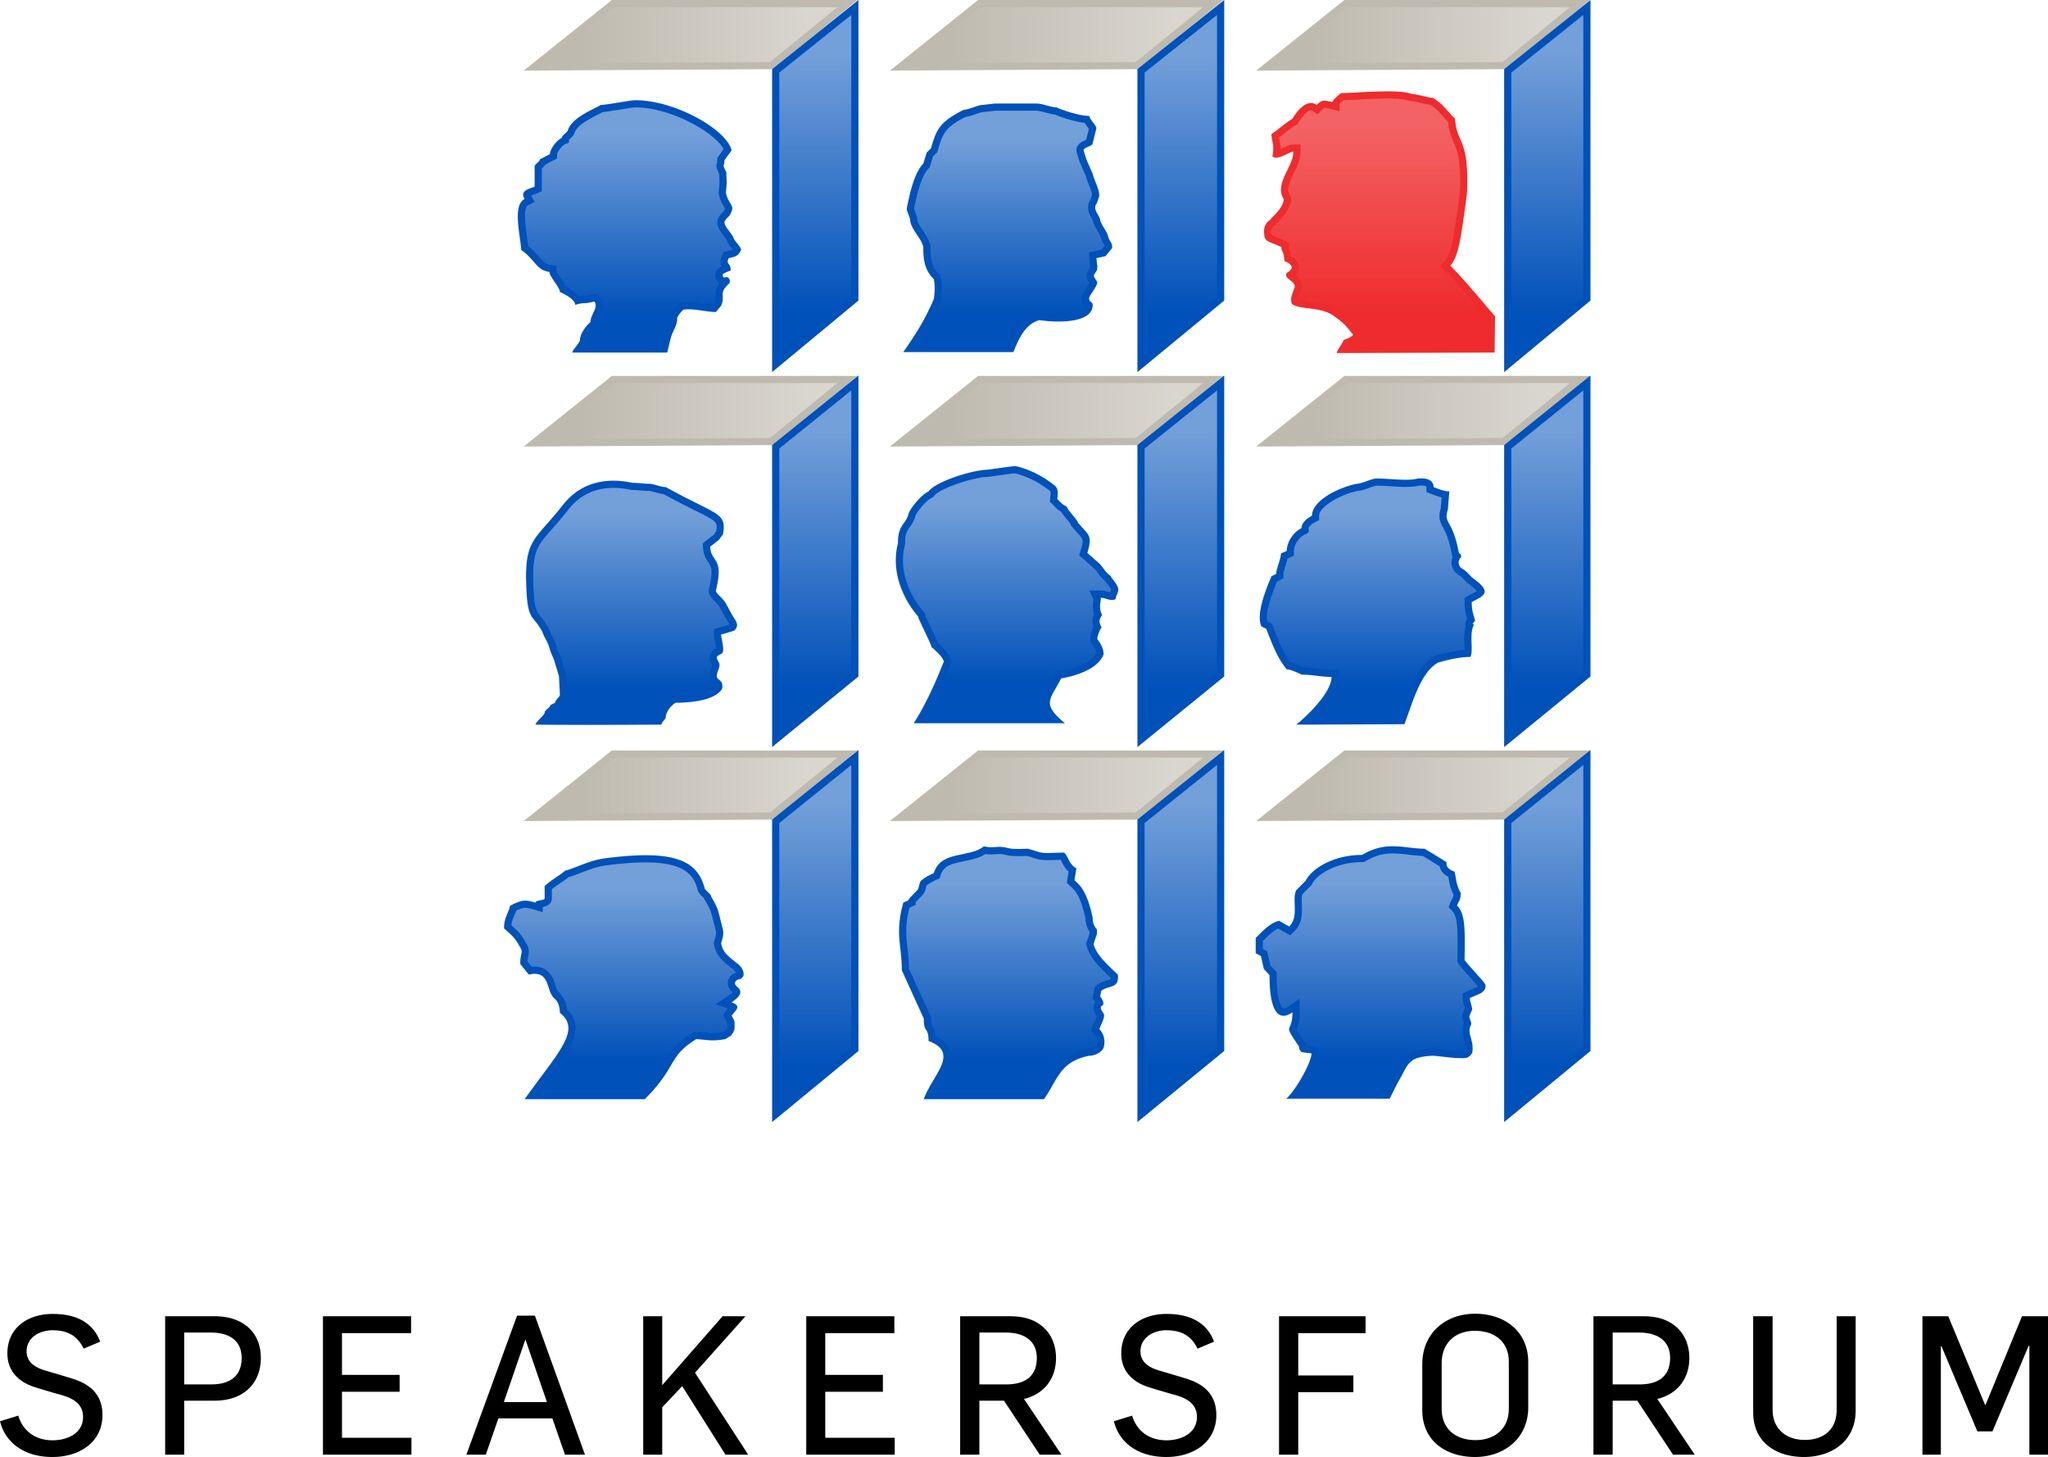 Oy Speakersforum Ab logo